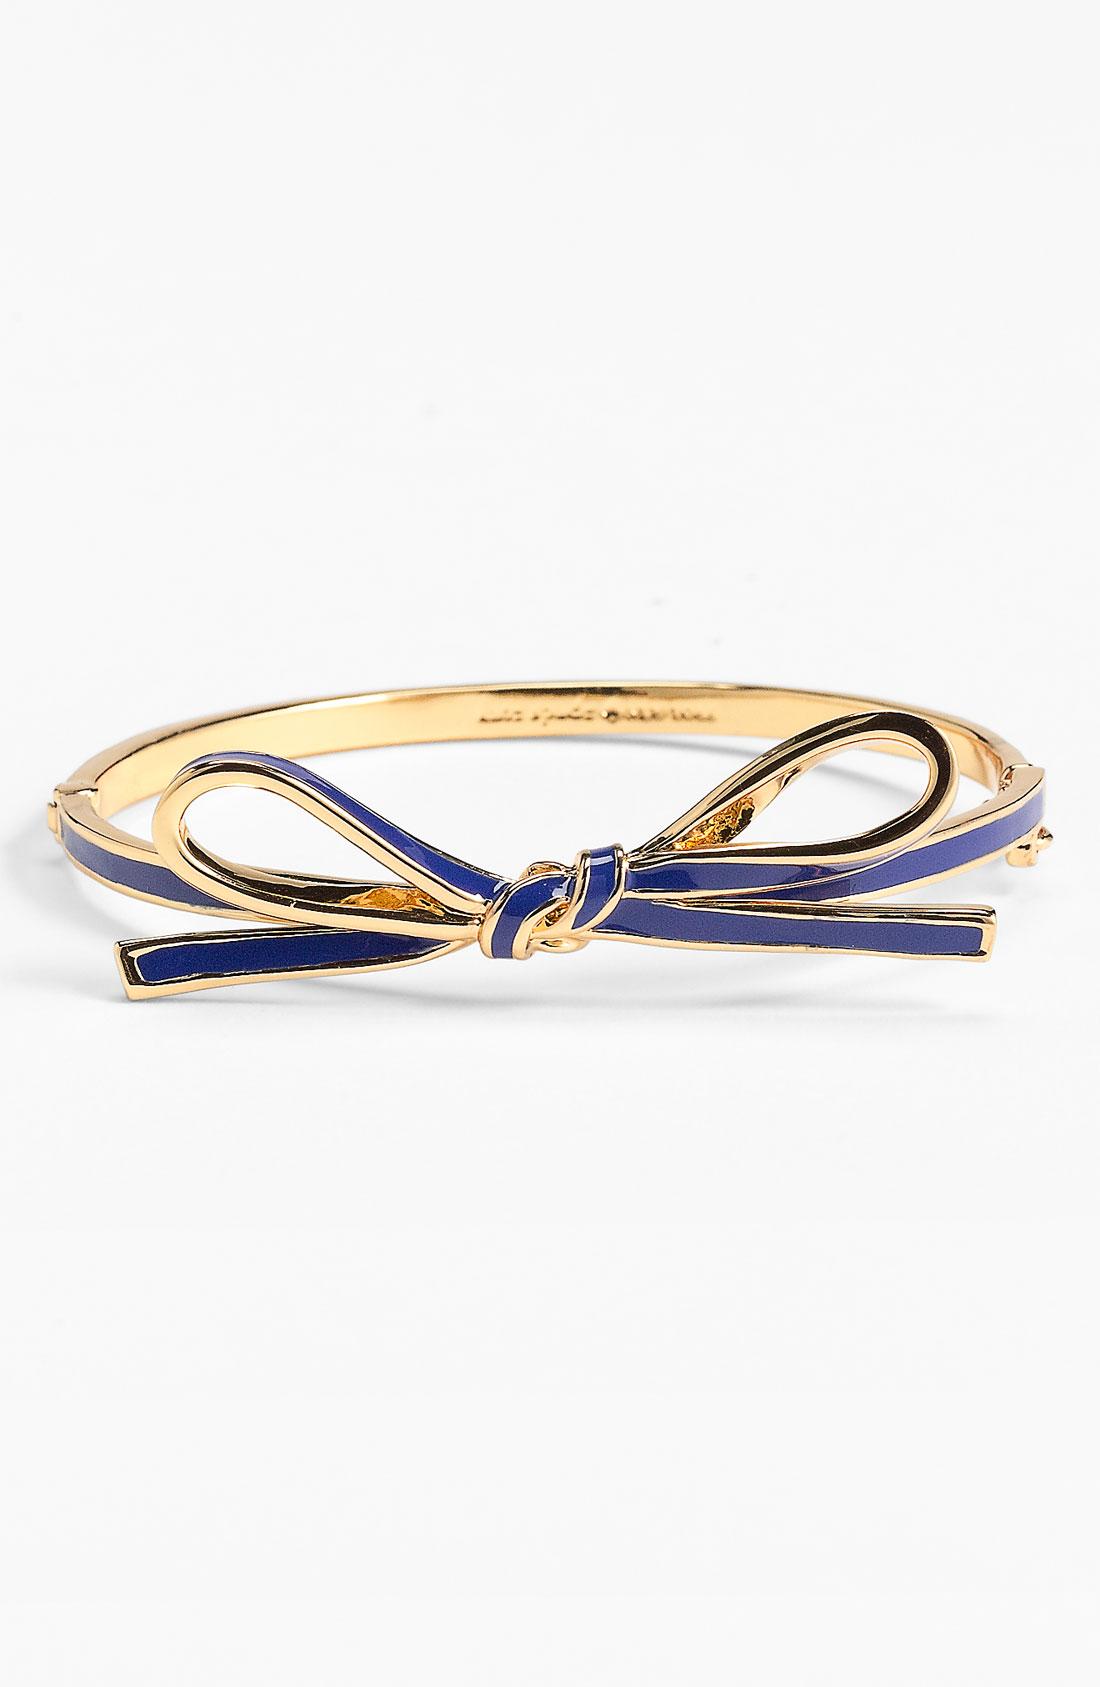 Kate spade skinny mini bow bangle in blue royal blue gold lyst